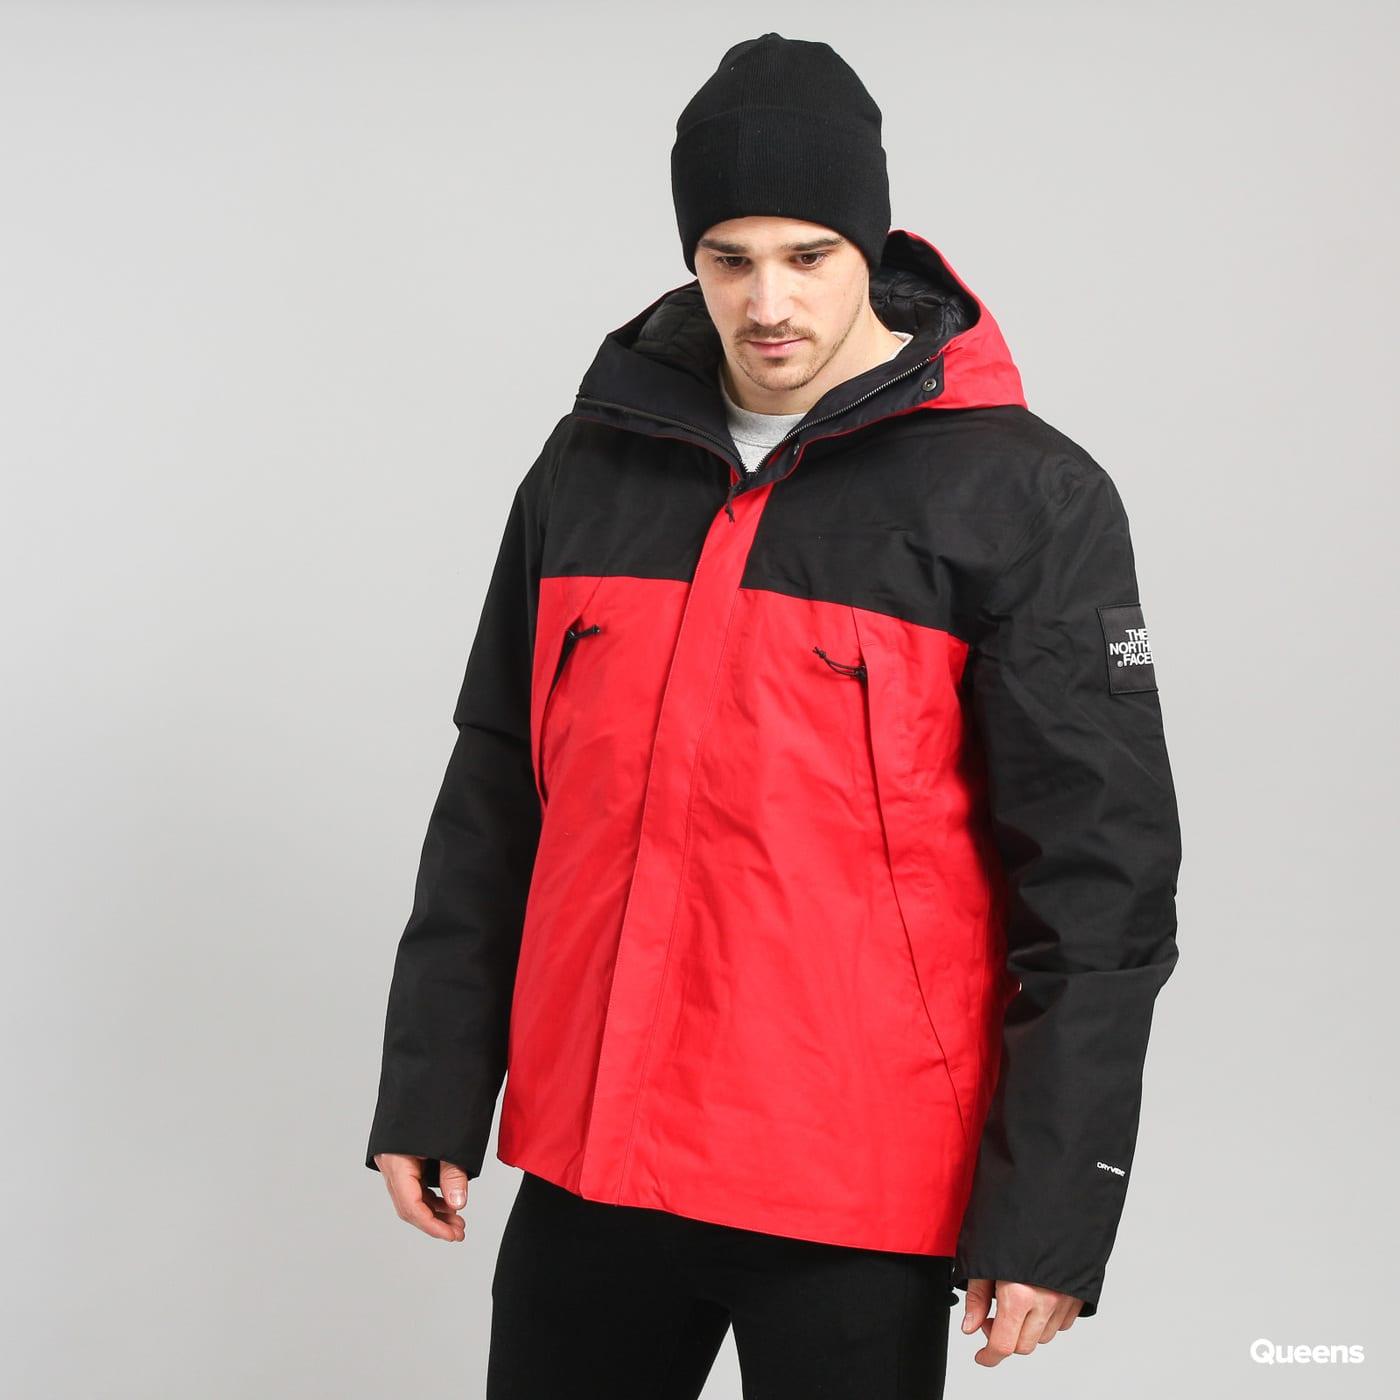 Pánska zimná bunda The North Face 1990 Thermoball Mountain Jacket  (T92ZWM682) – Queens 💚 ff81df6846d